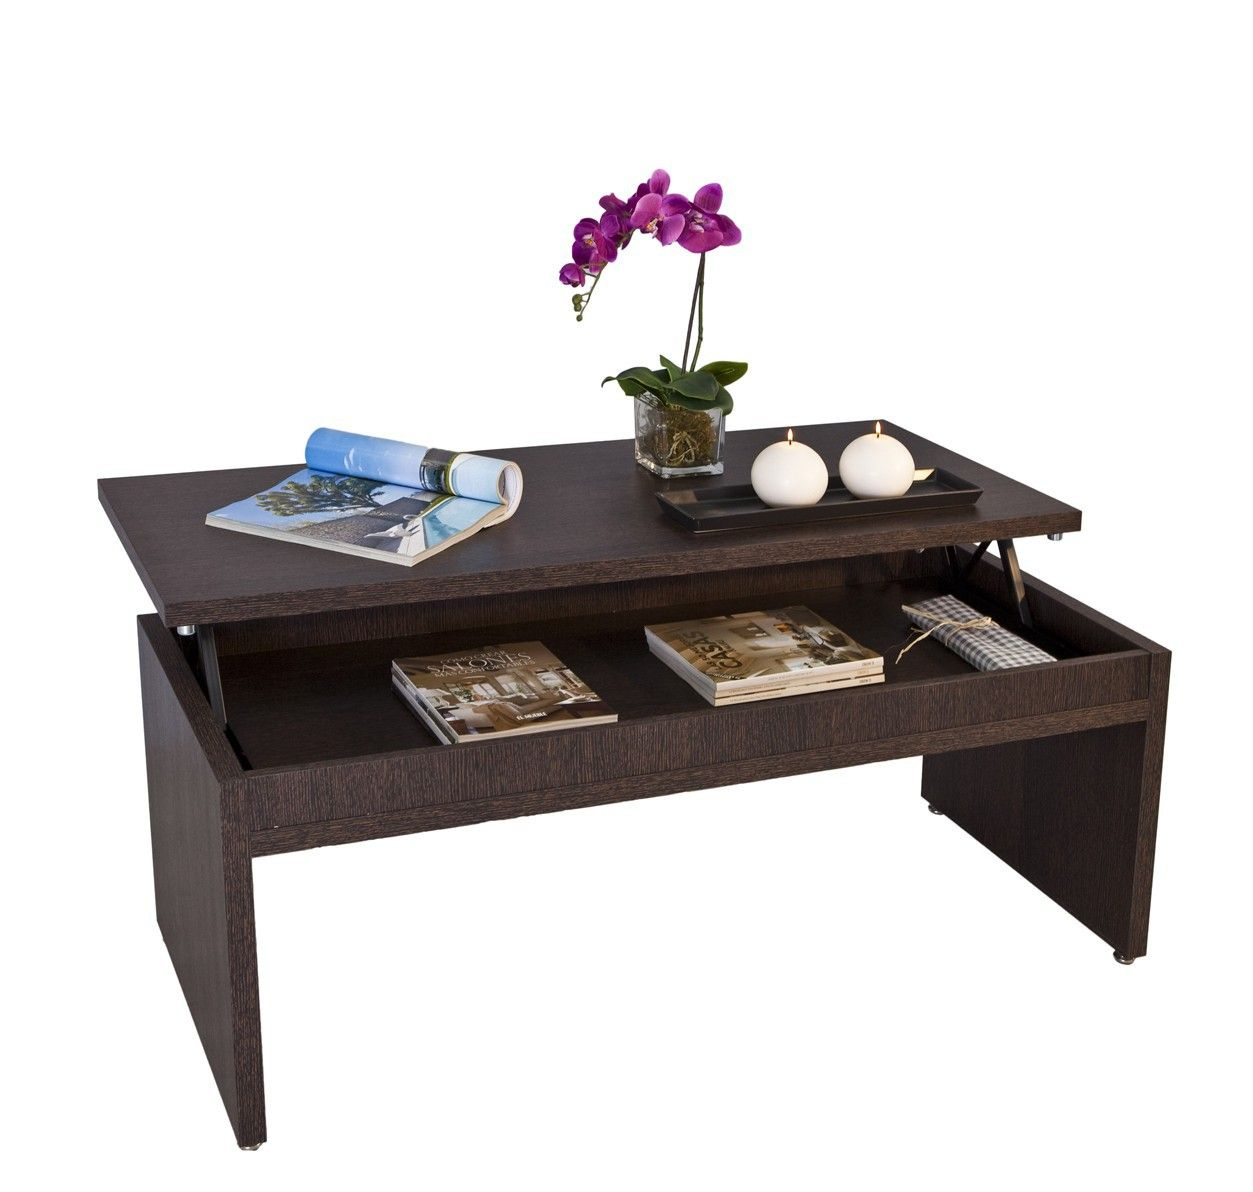 Muebles De Sal N Comedor Baratos Comprar Muebles Sal N Modernos  # Muebles Kit Baratos